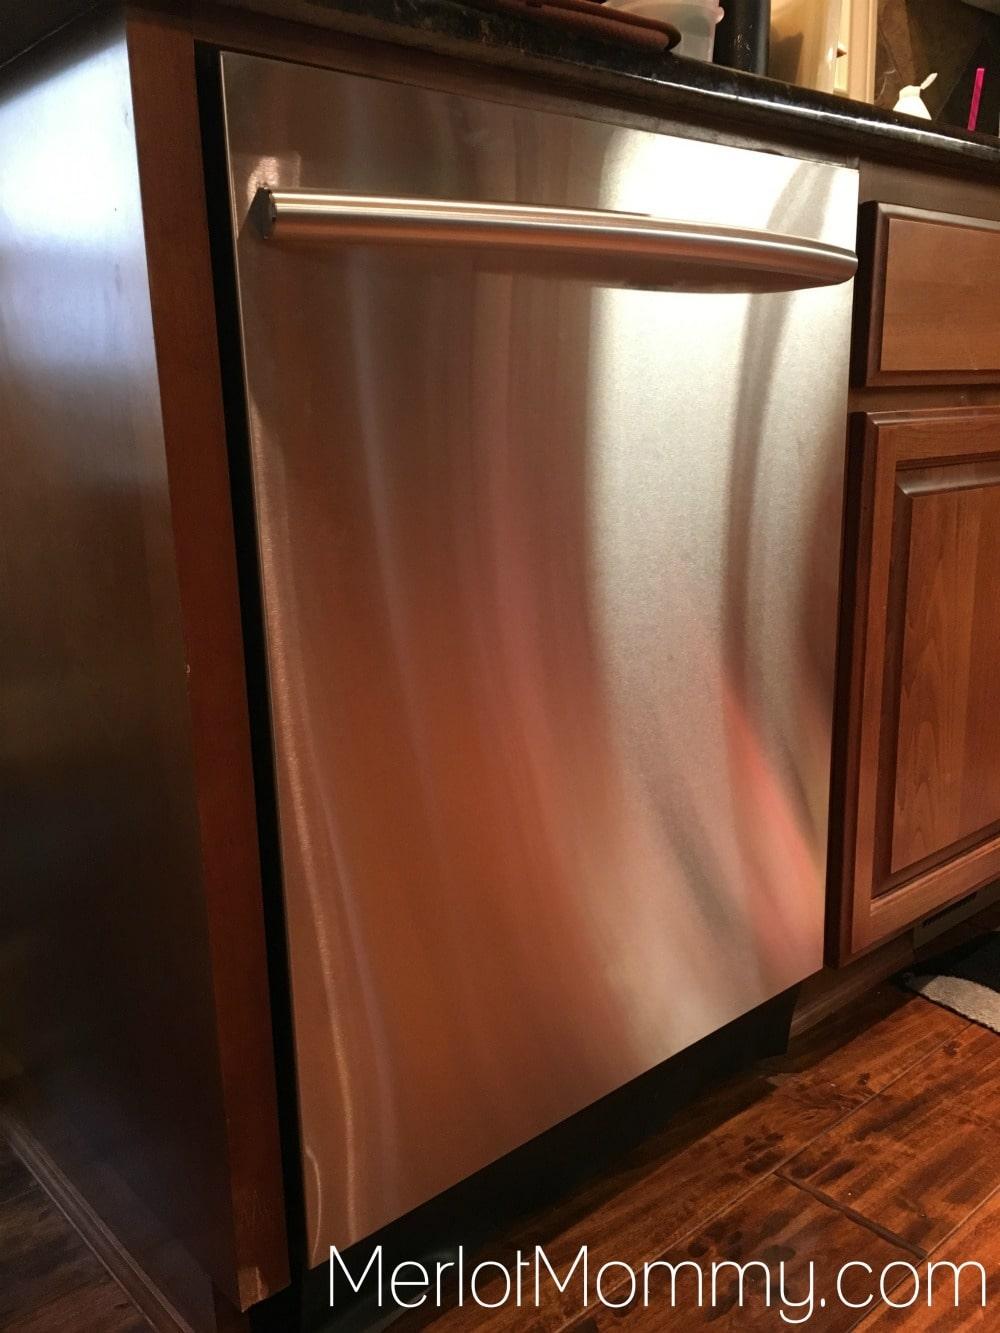 Stainless Steel Samsung StormWash 7050 Dishwasher at Best Buy